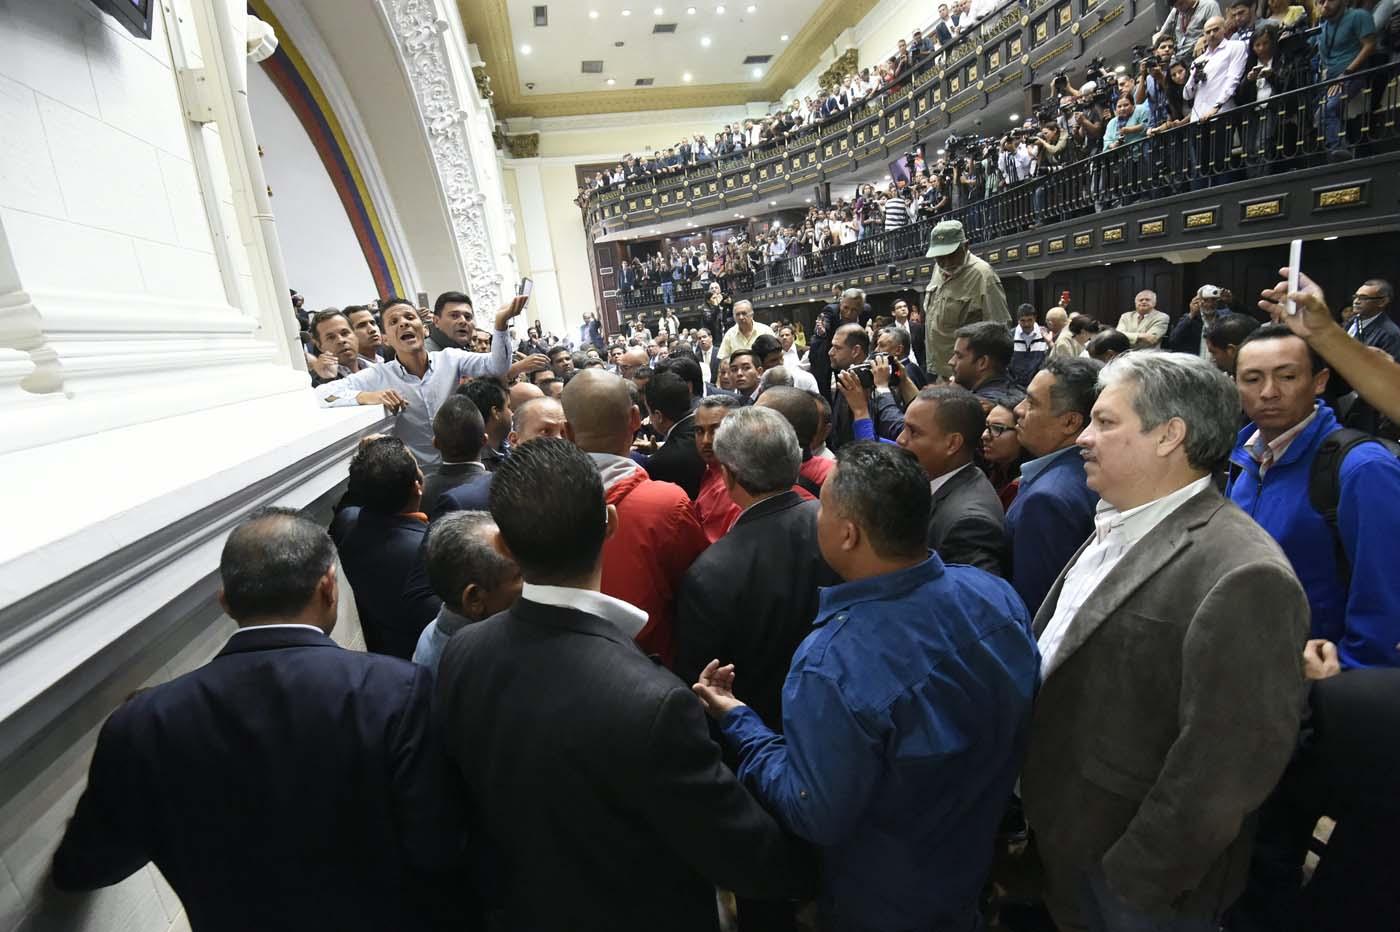 Gobierno de Nicolas Maduro. - Página 18 000_HF3CU